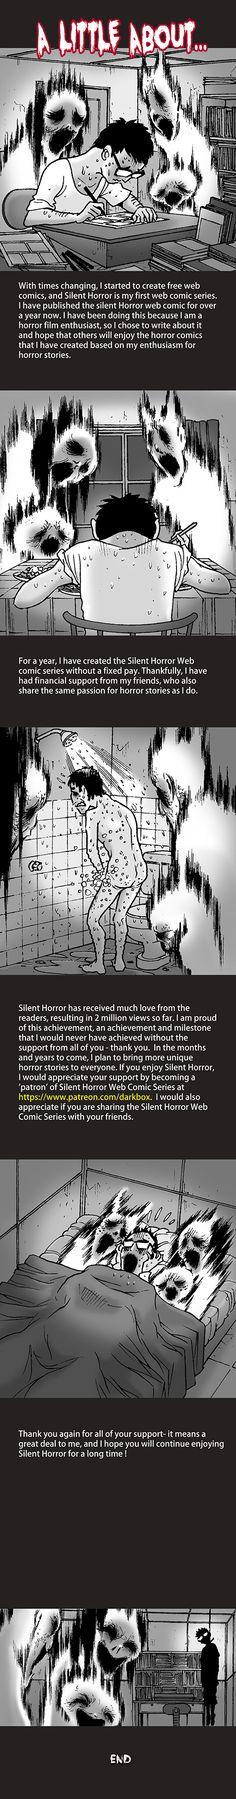 Silent Horror - A Little About